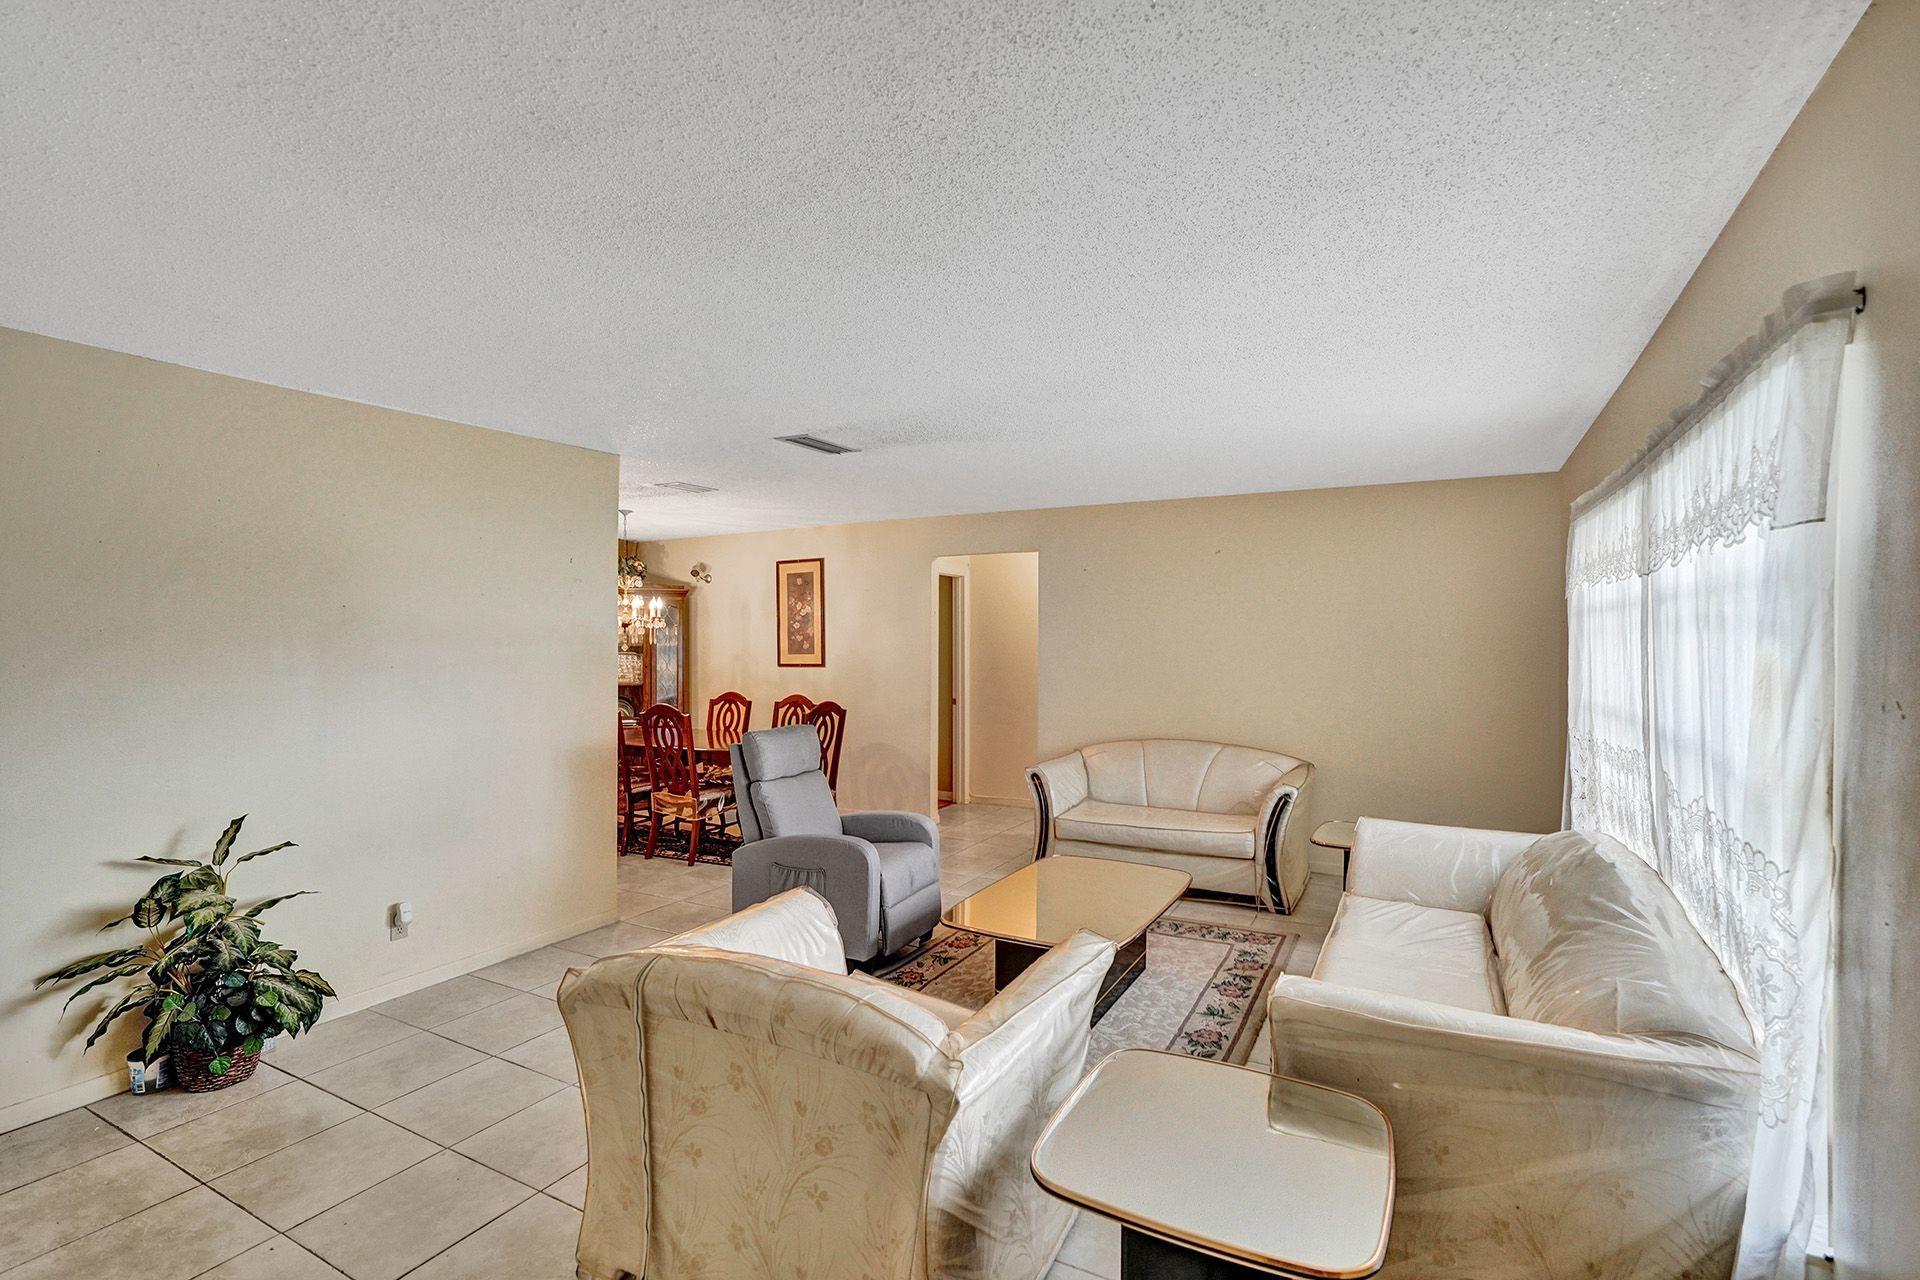 720 73rd Avenue,Margate,Florida 33063,2 Bedrooms Bedrooms,2 BathroomsBathrooms,Single family detached,73rd,RX-10672620